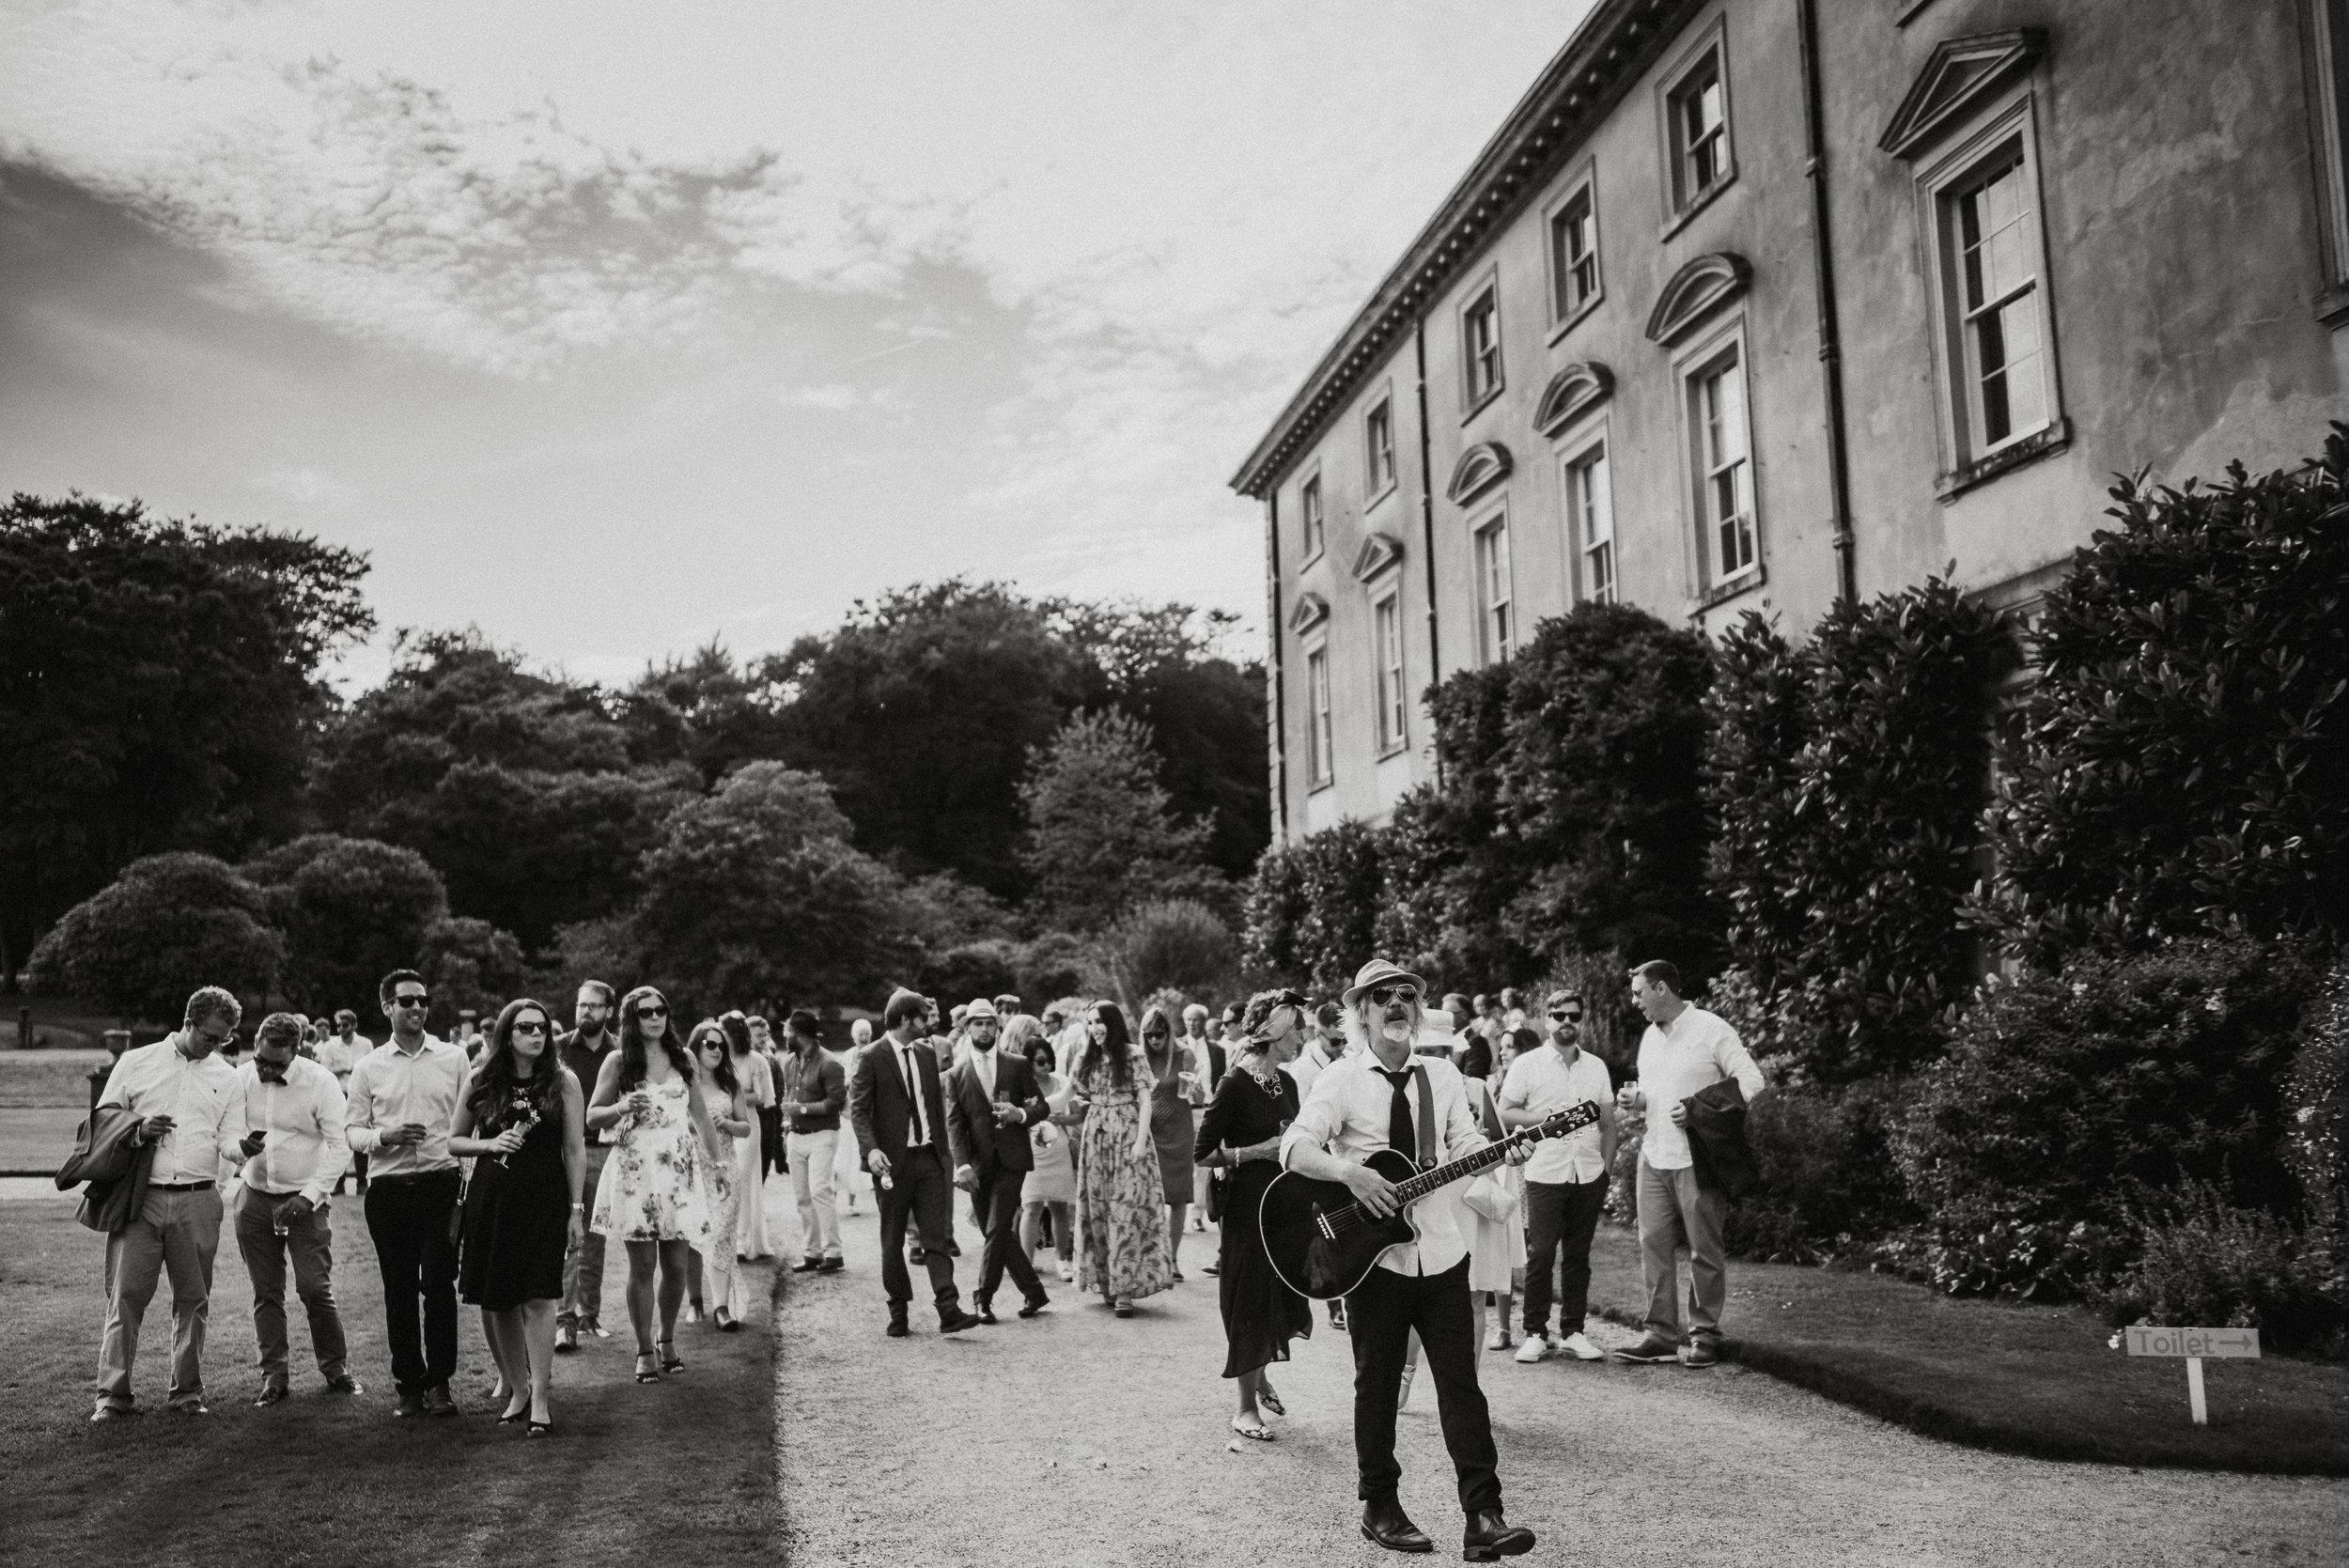 pencarrow-house-wedding-photographer-99.jpg